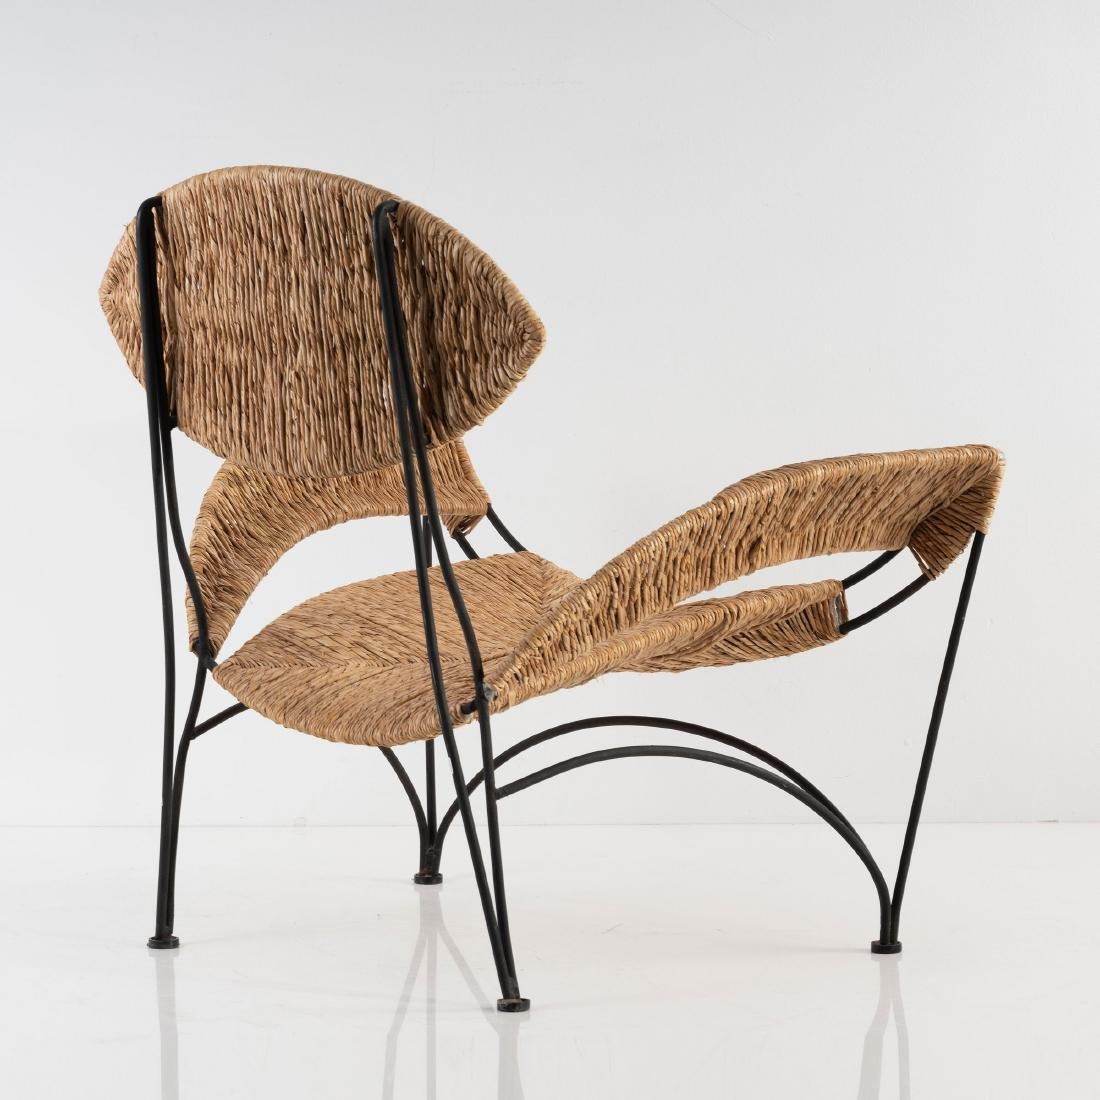 'Banana chair', 1988 - 6